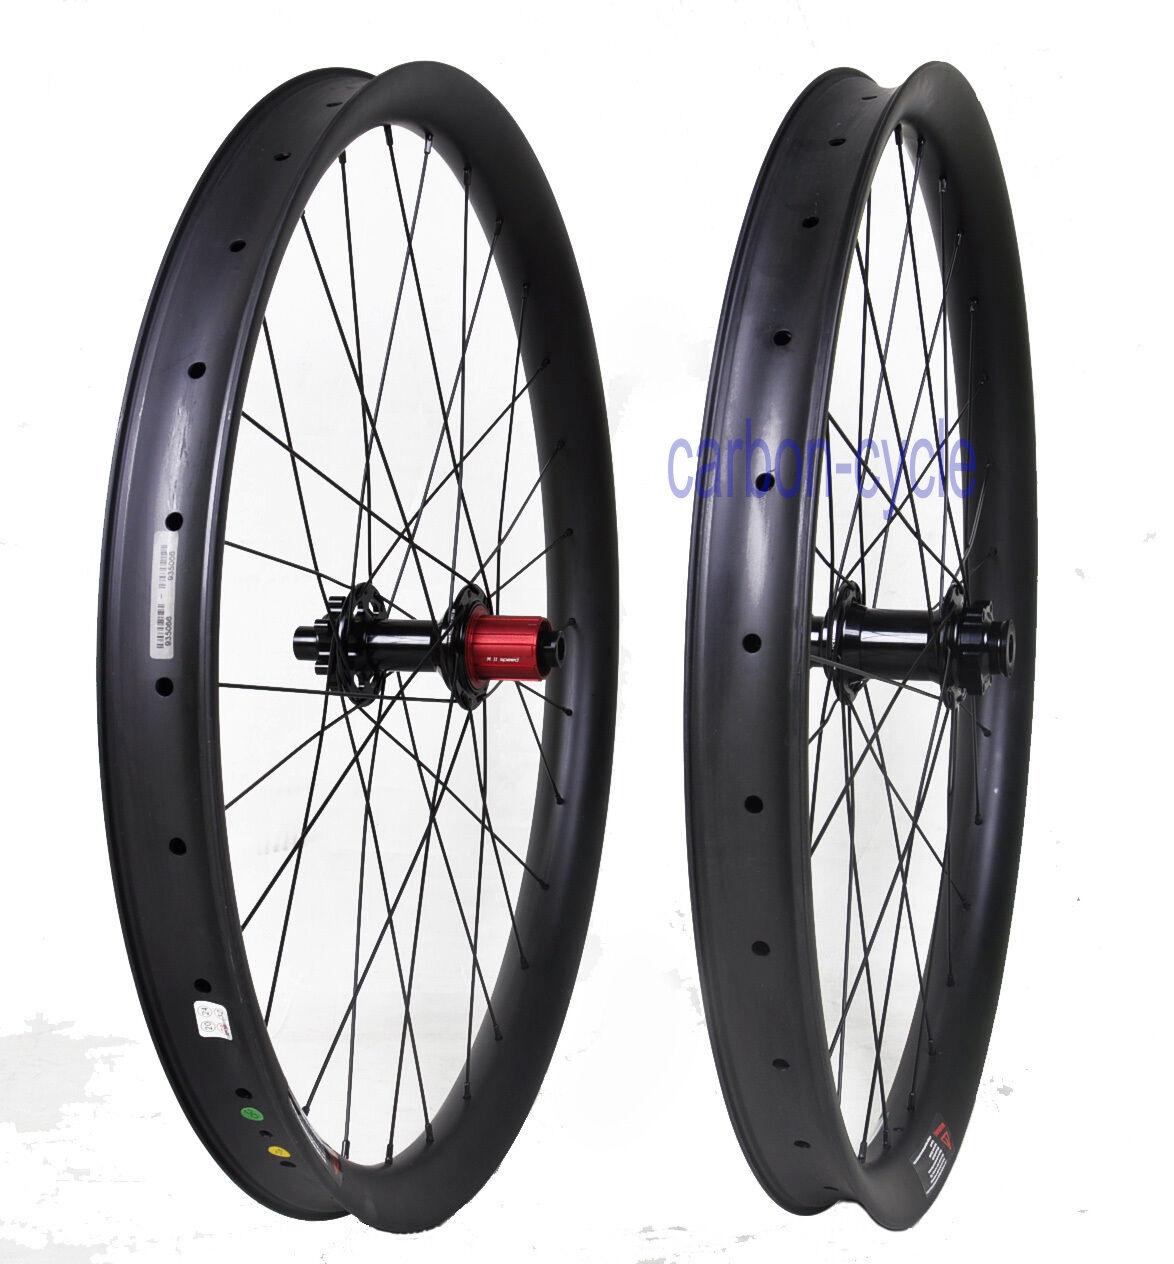 27.5er Boost 50mm Carbon Wheelset 110 148 Thru Axle Clincher MTB Bike Matt PLUS